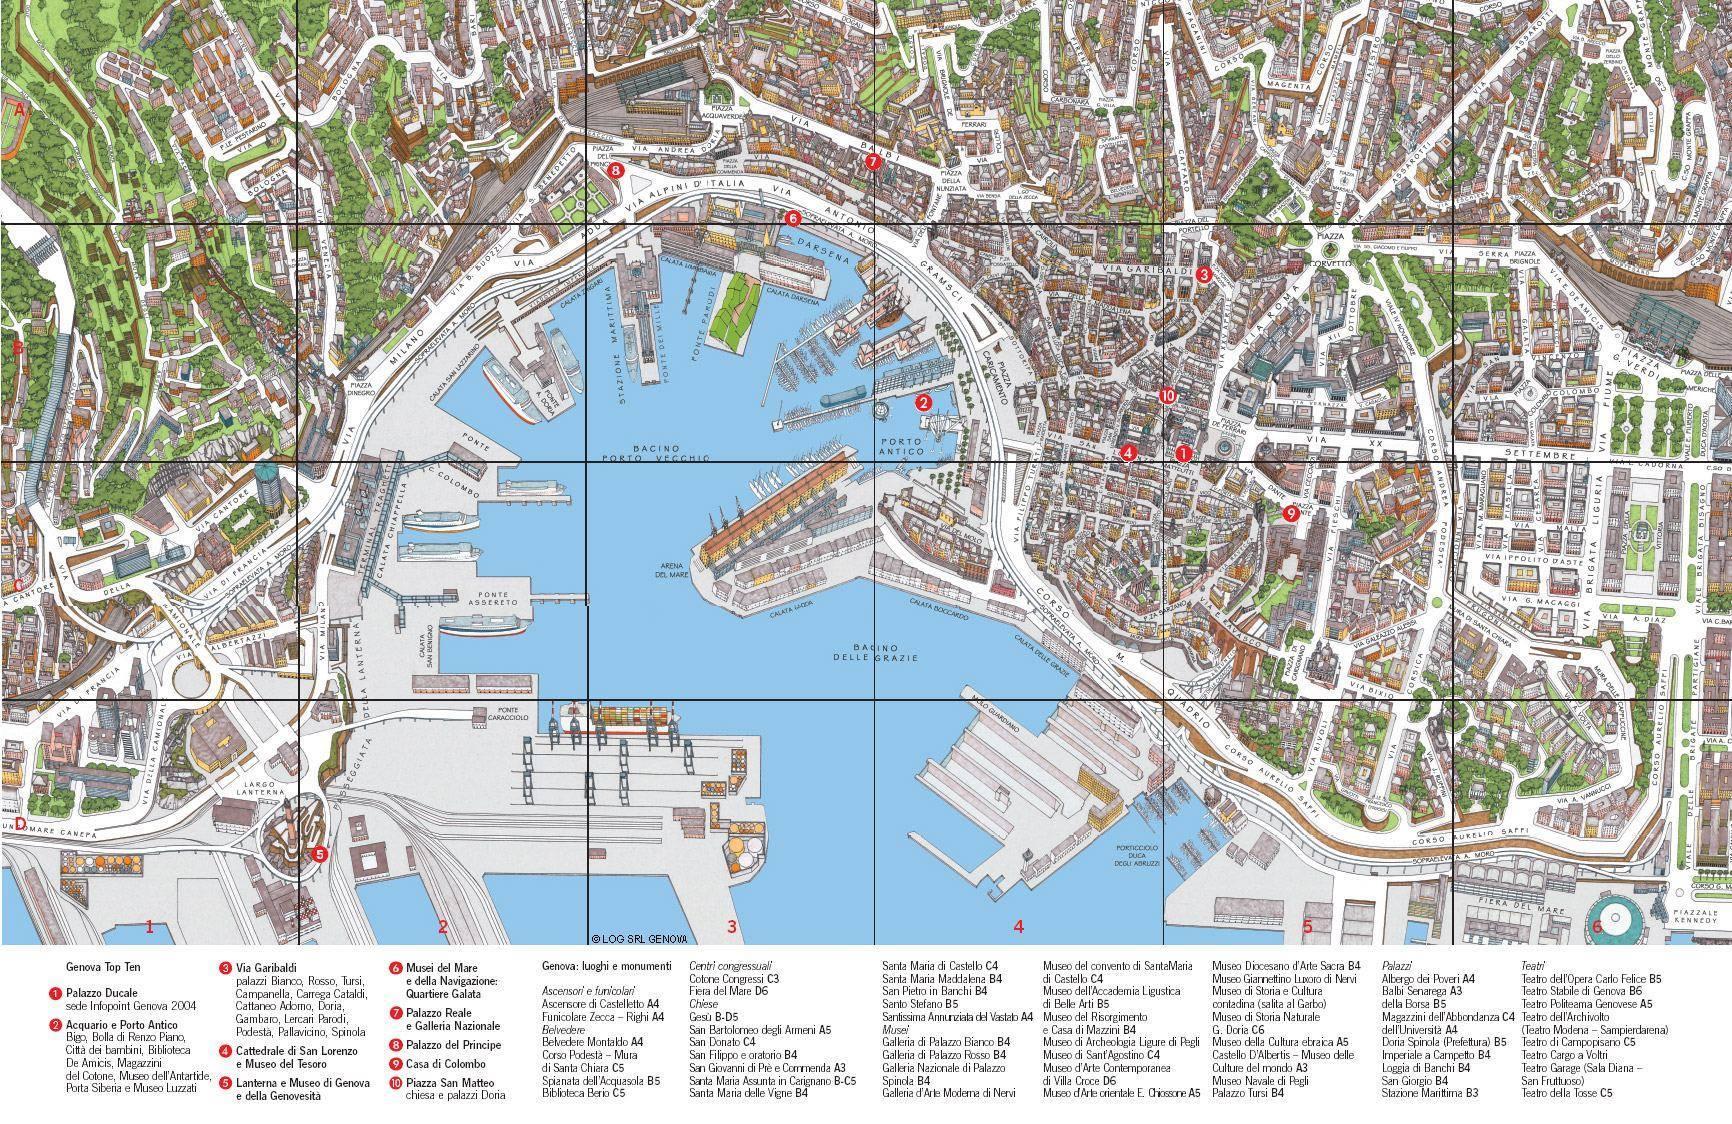 Genova Cartina.Mappa Di Genova Cartina Di Genova